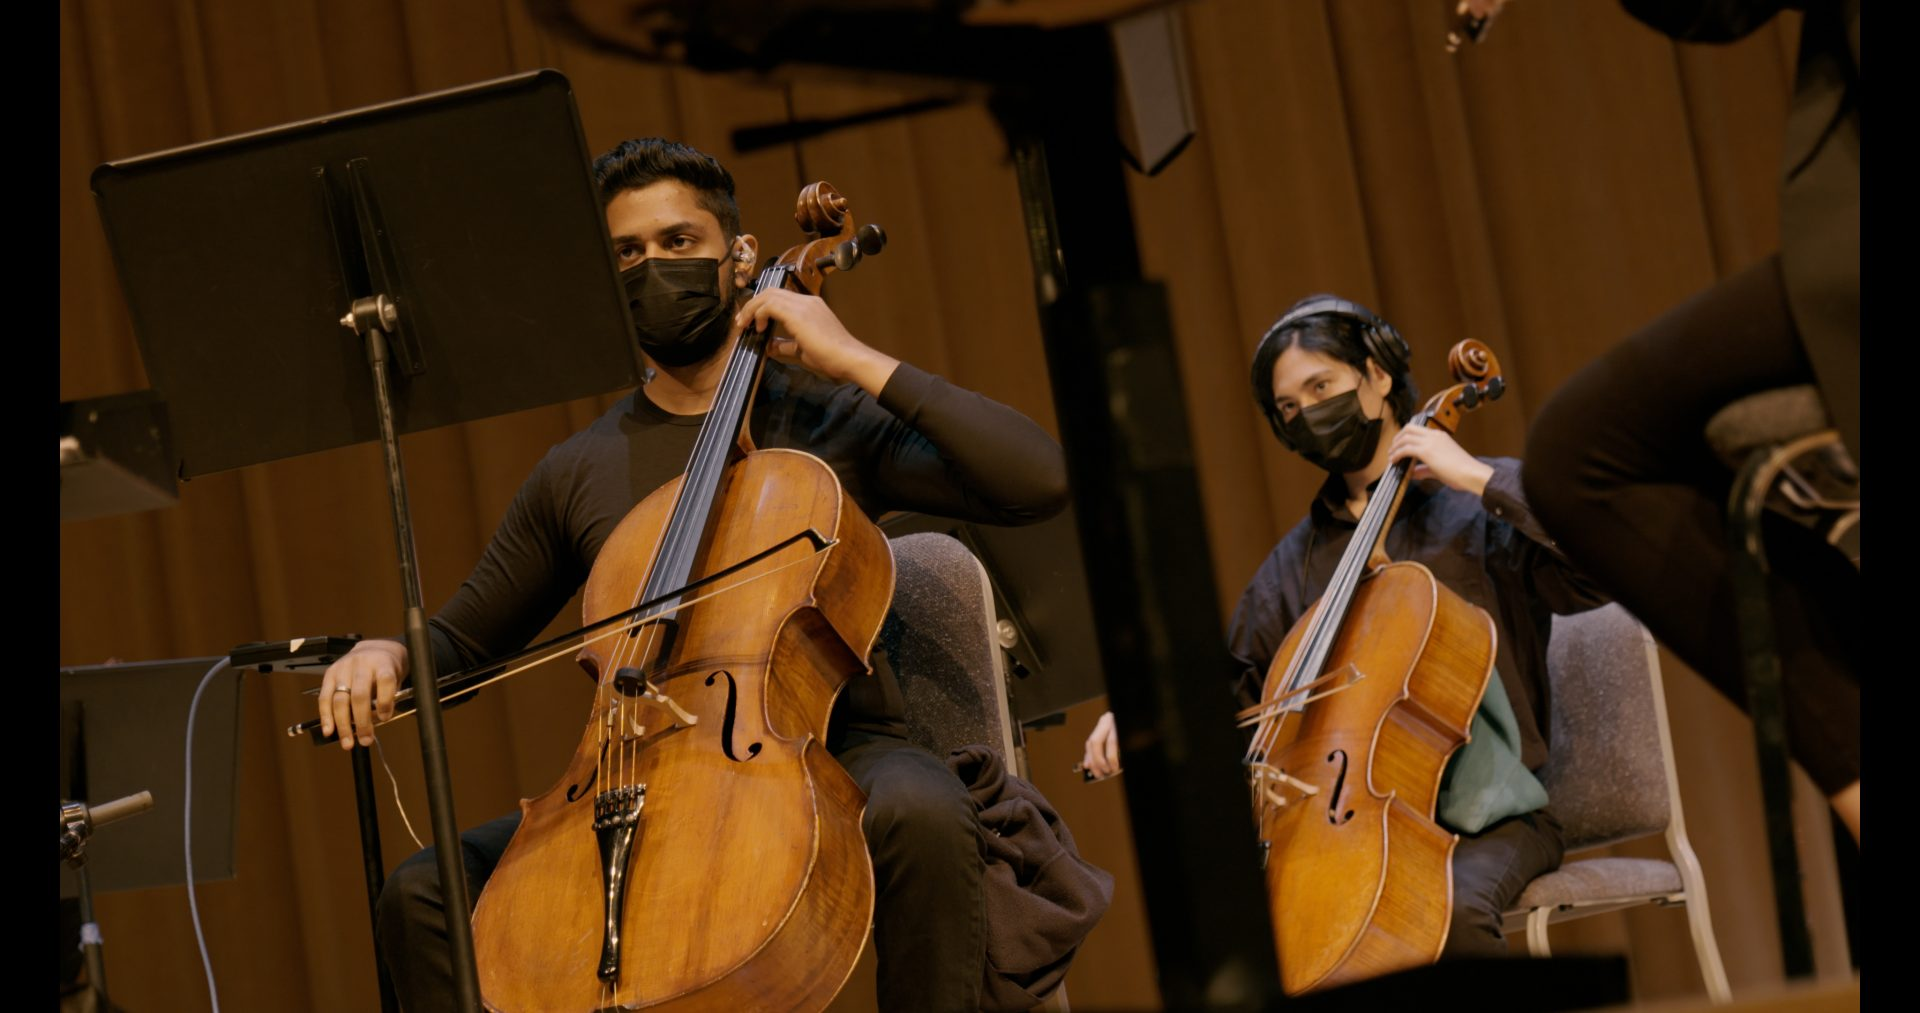 Cellists recording.